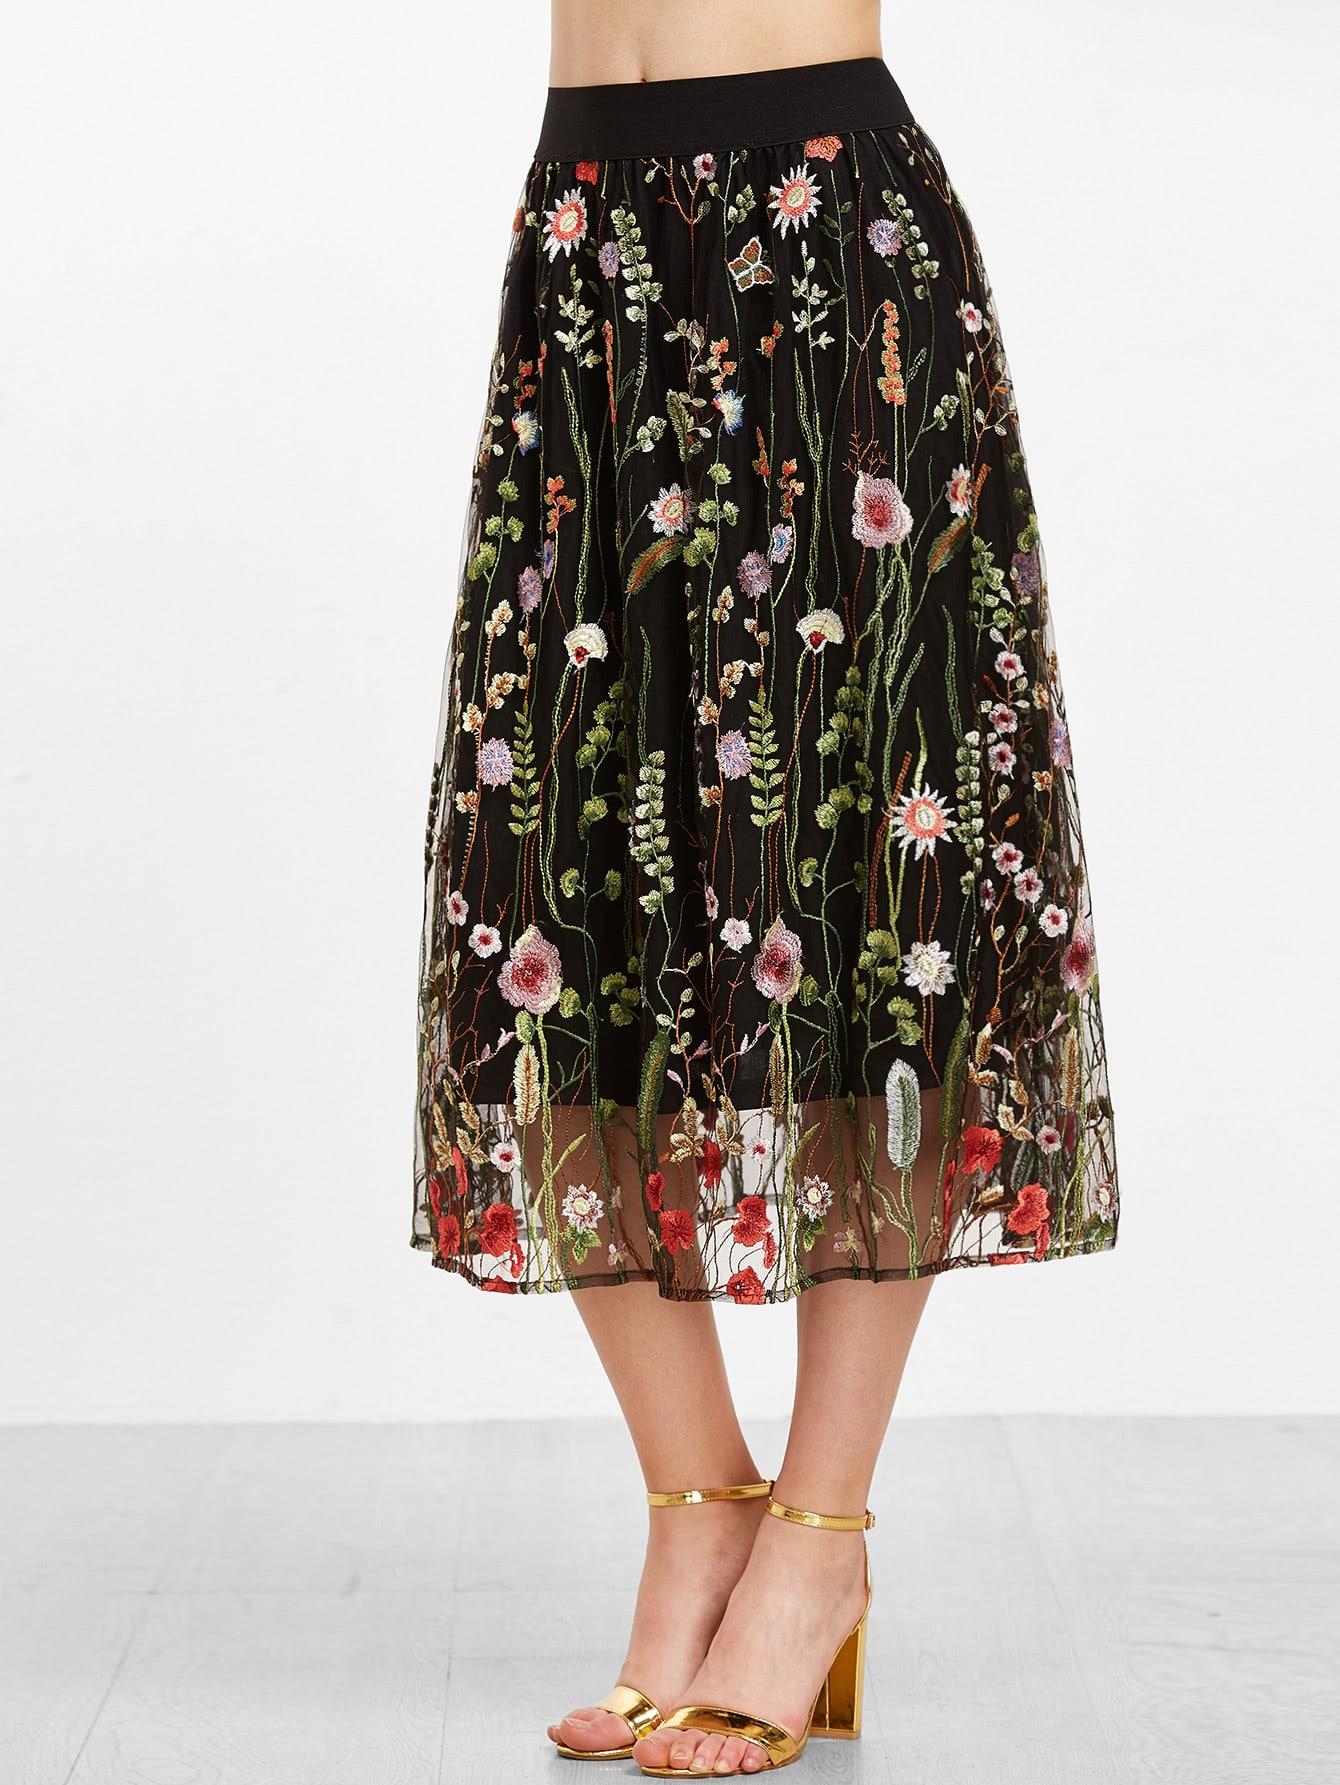 Floral Embroidered Mesh Overlay Tea Length Skirt Shein